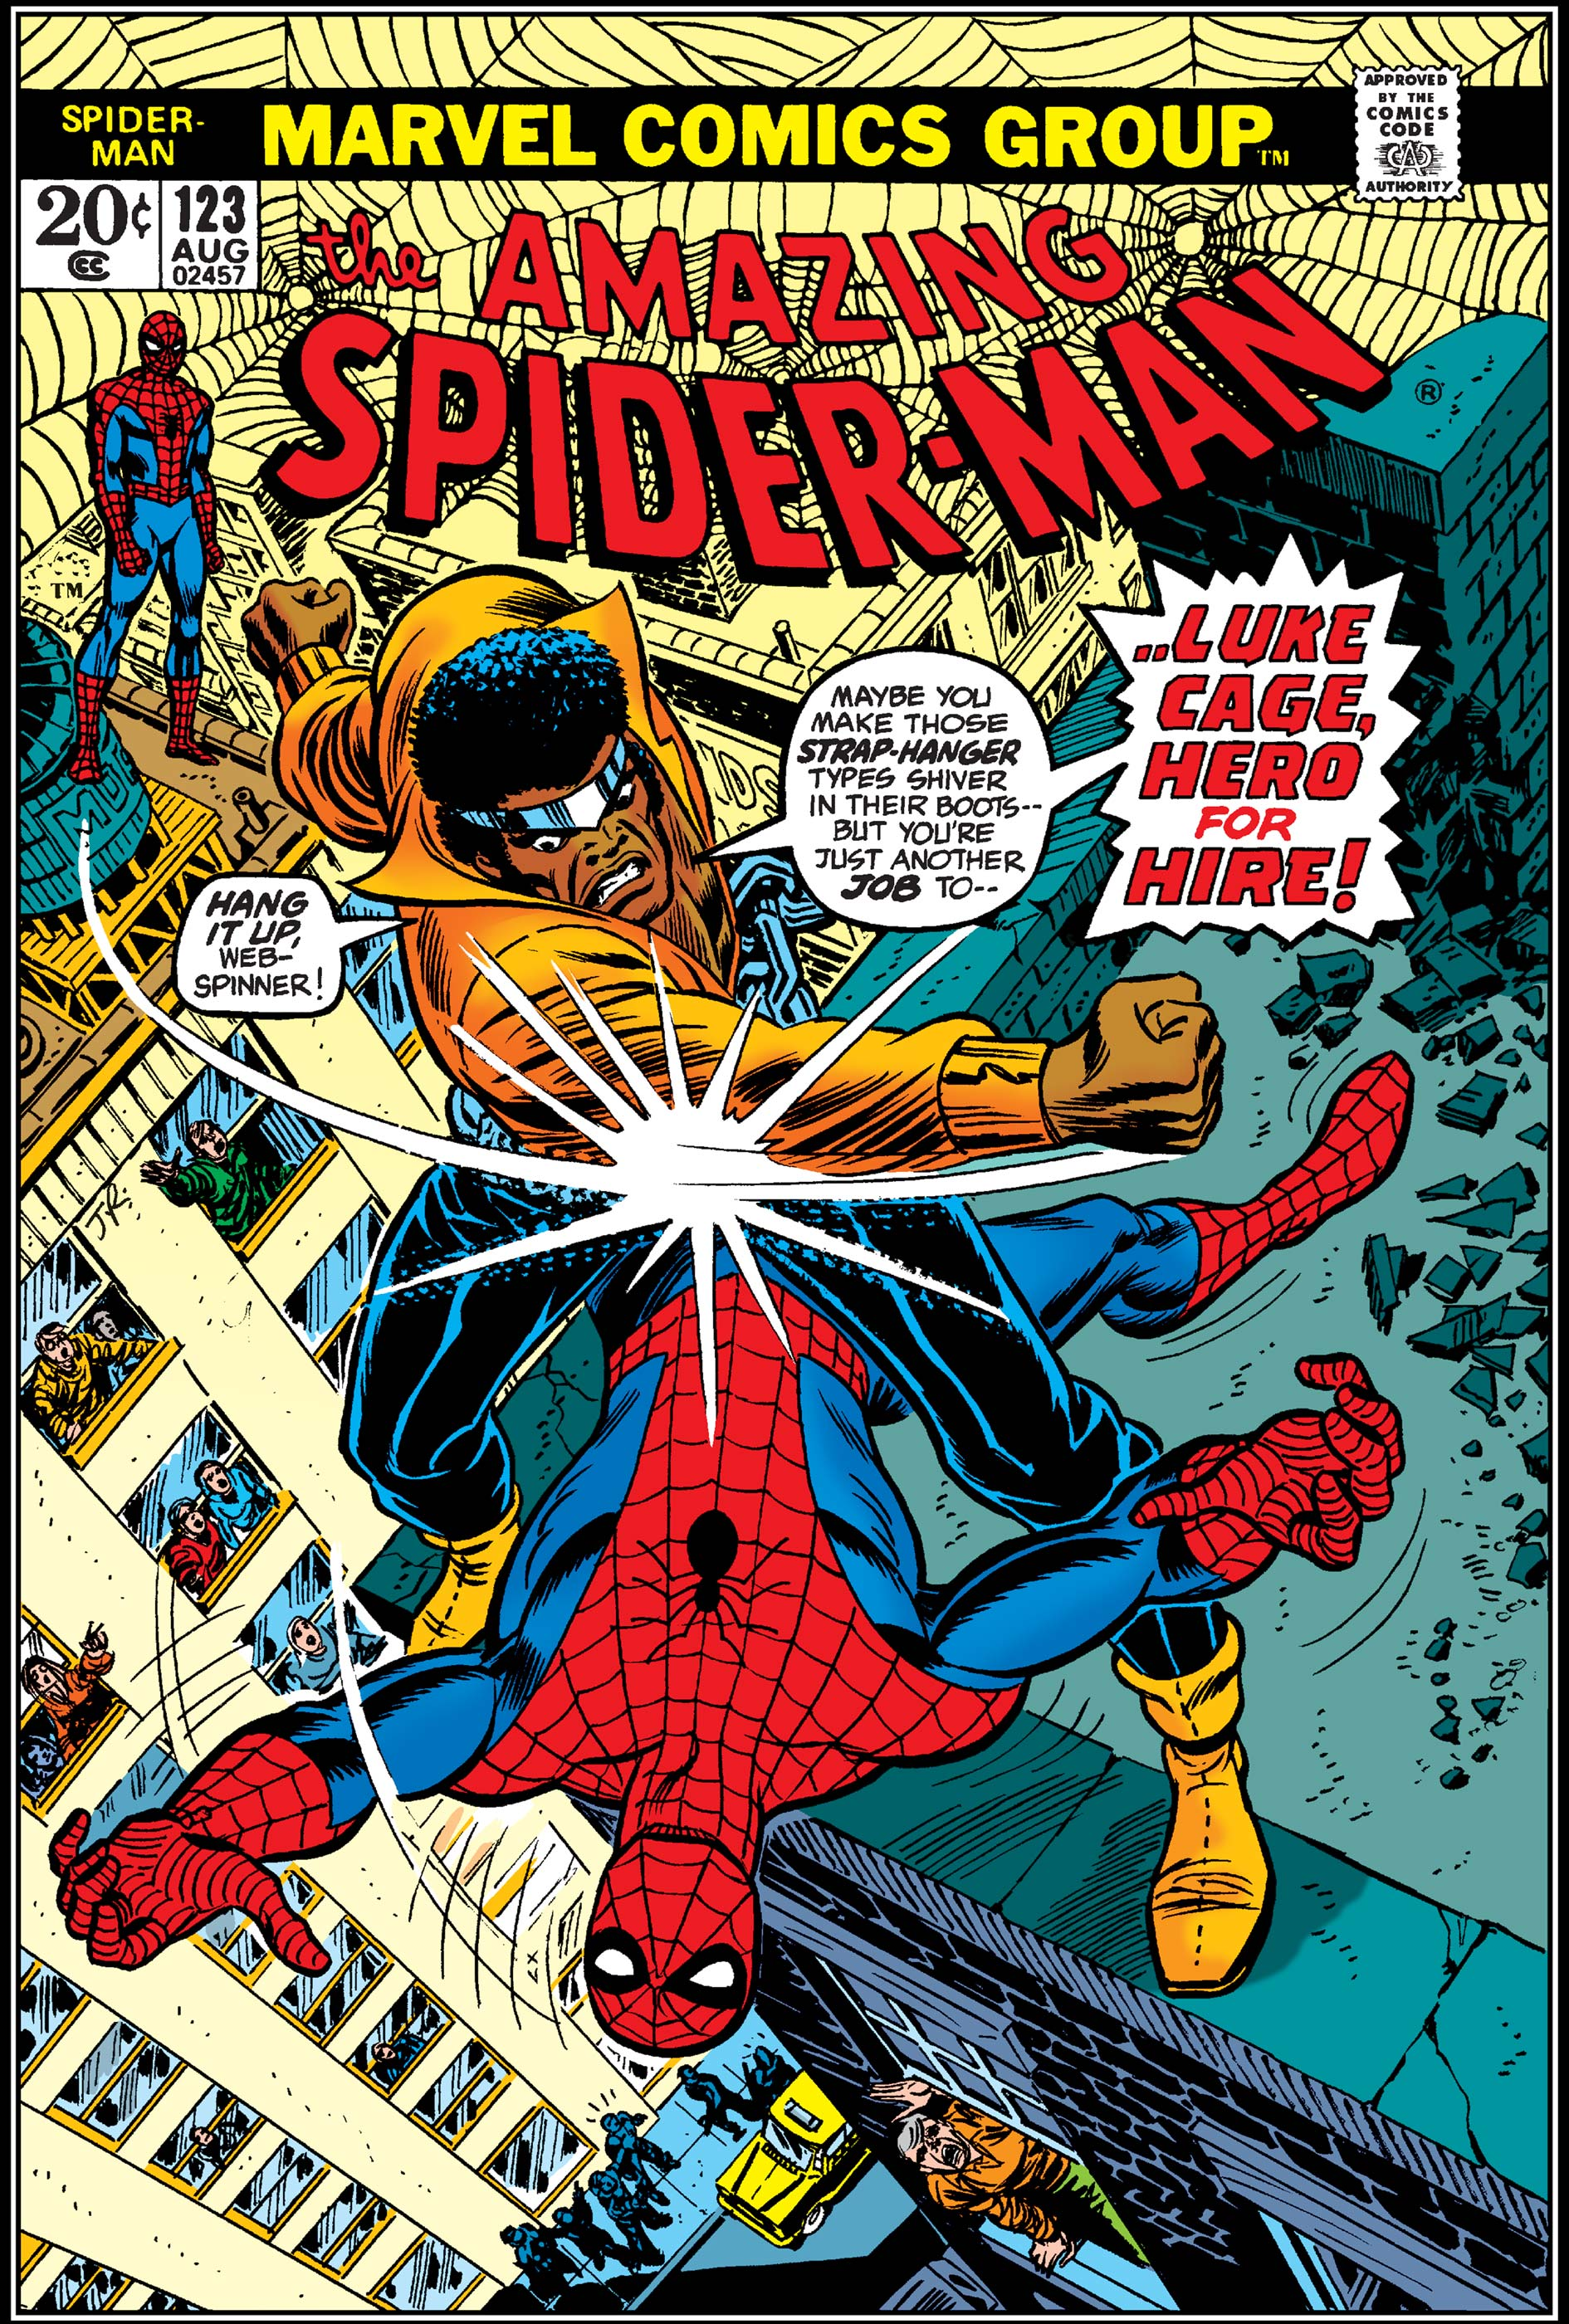 The Amazing Spider-Man (1963) #123